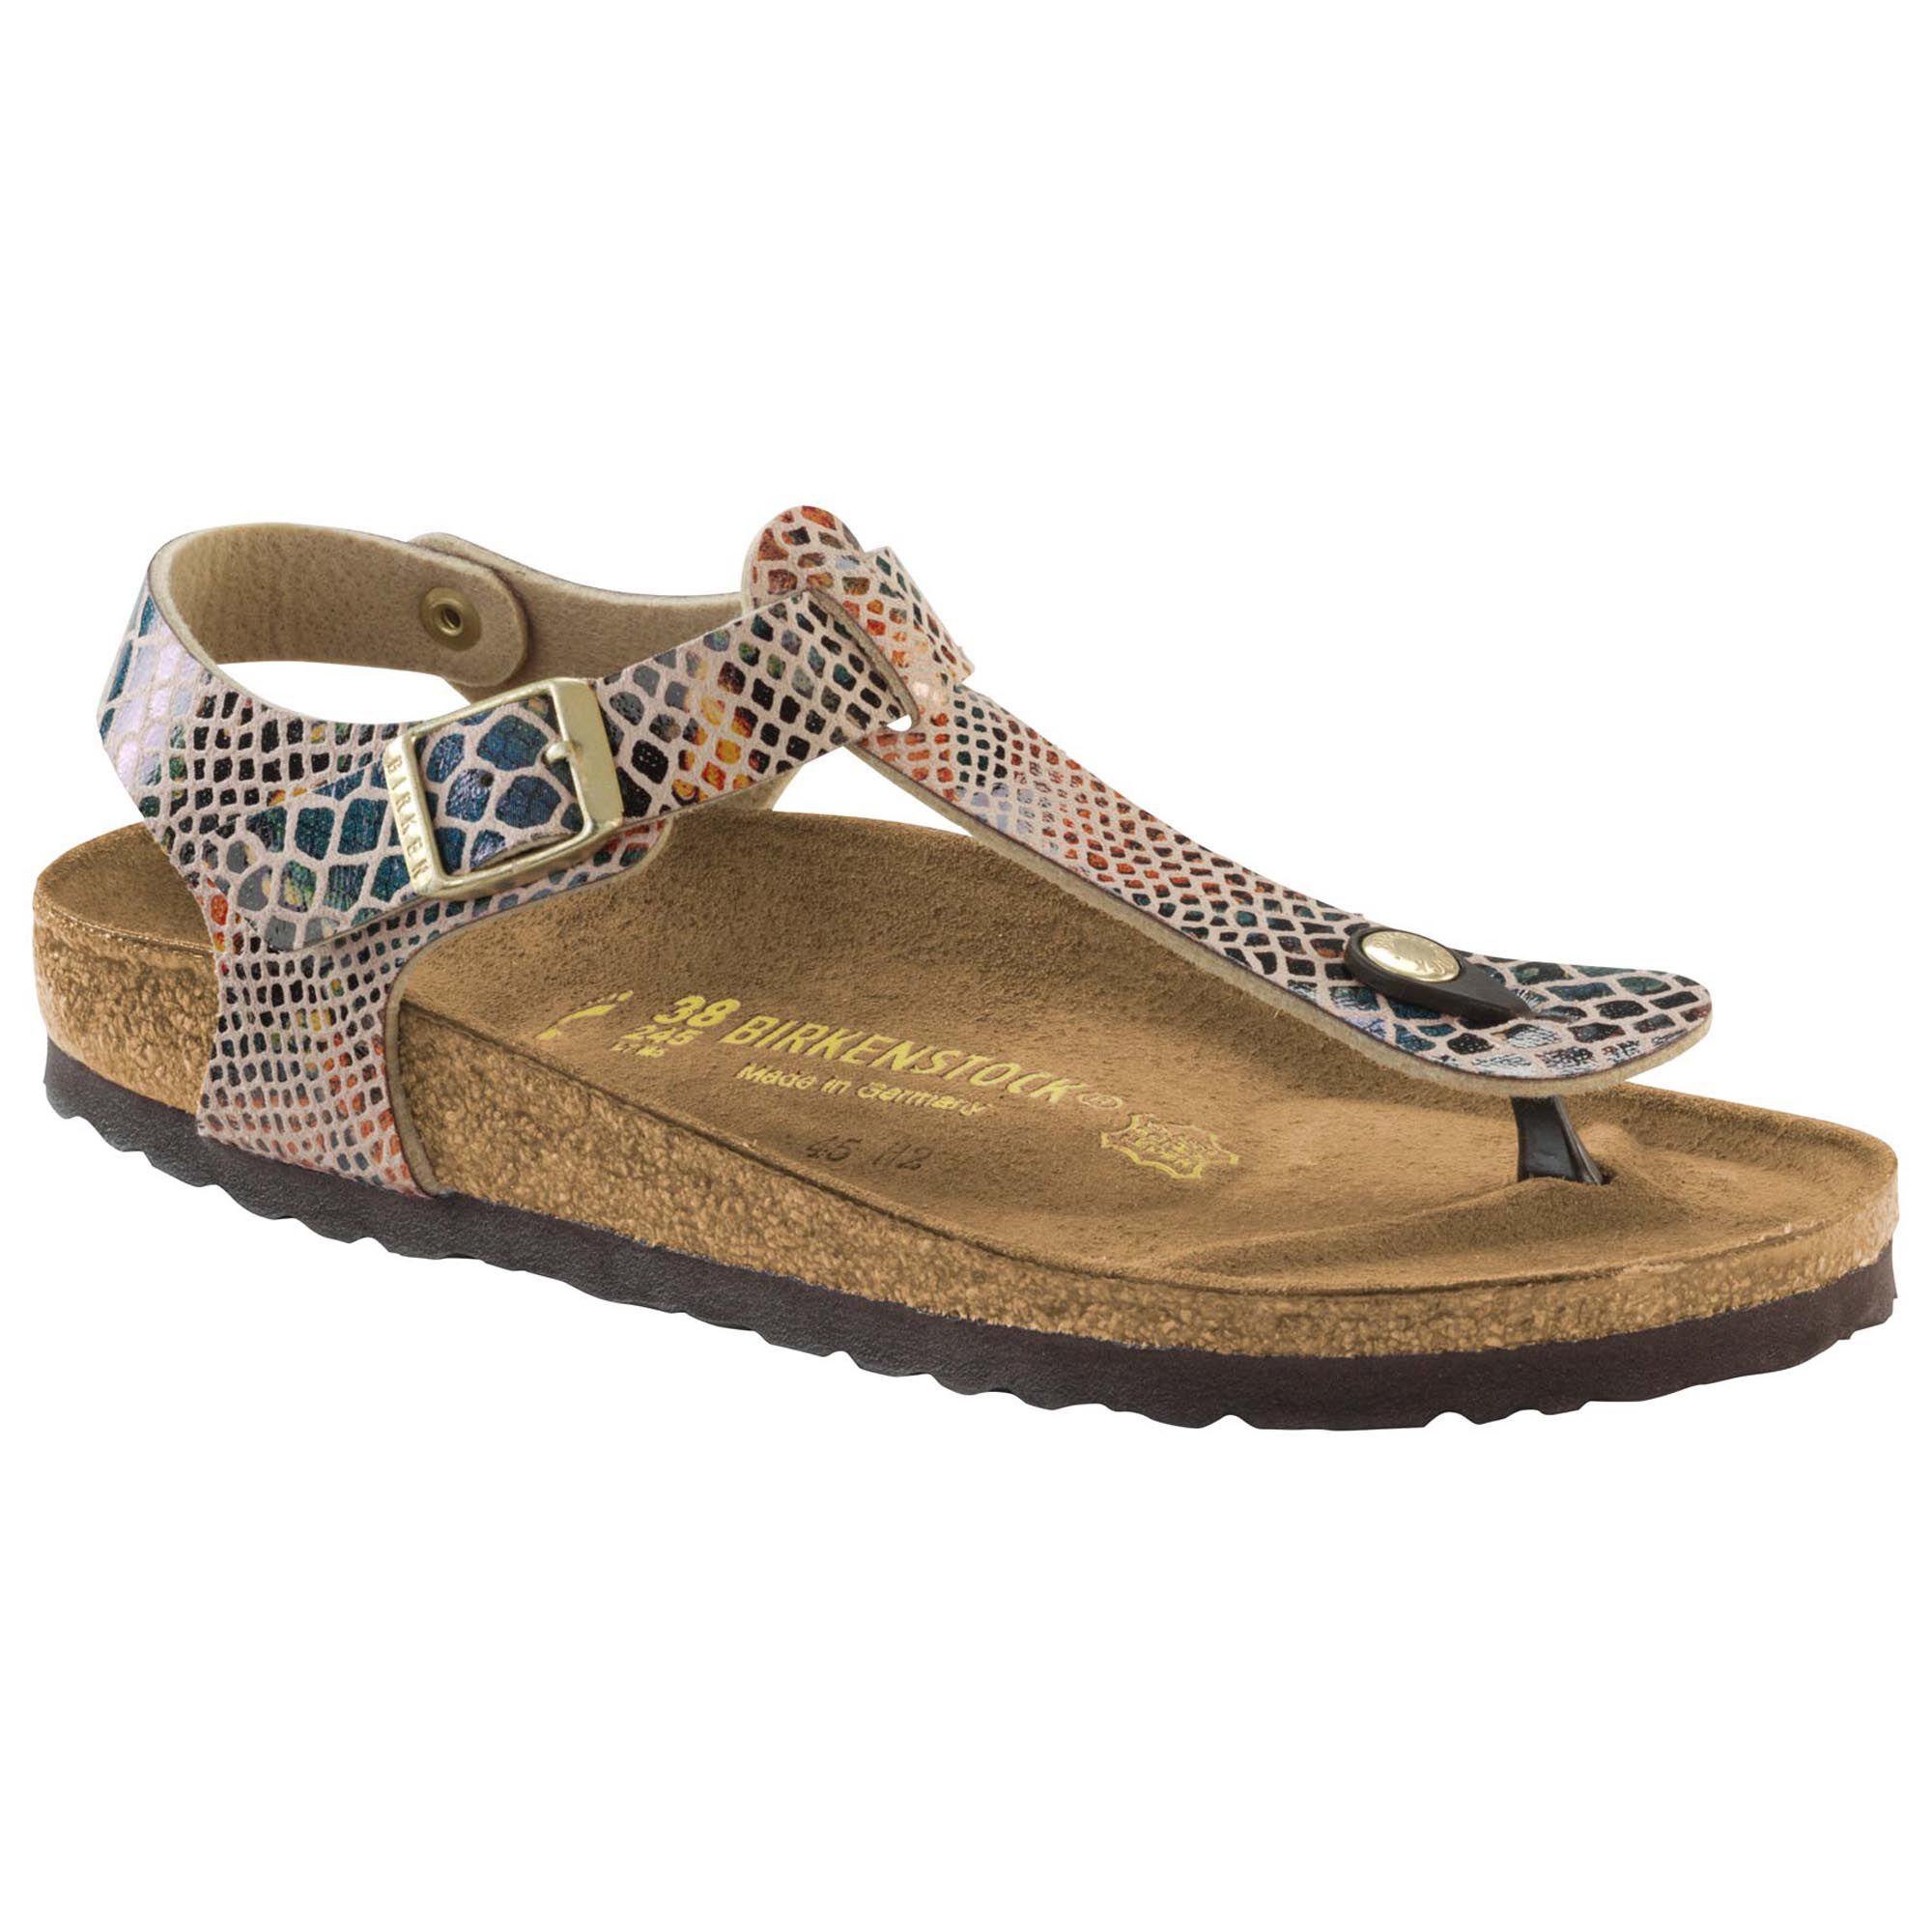 Damen Schuhe Designer Schlangenlederoptik Zehentrenner